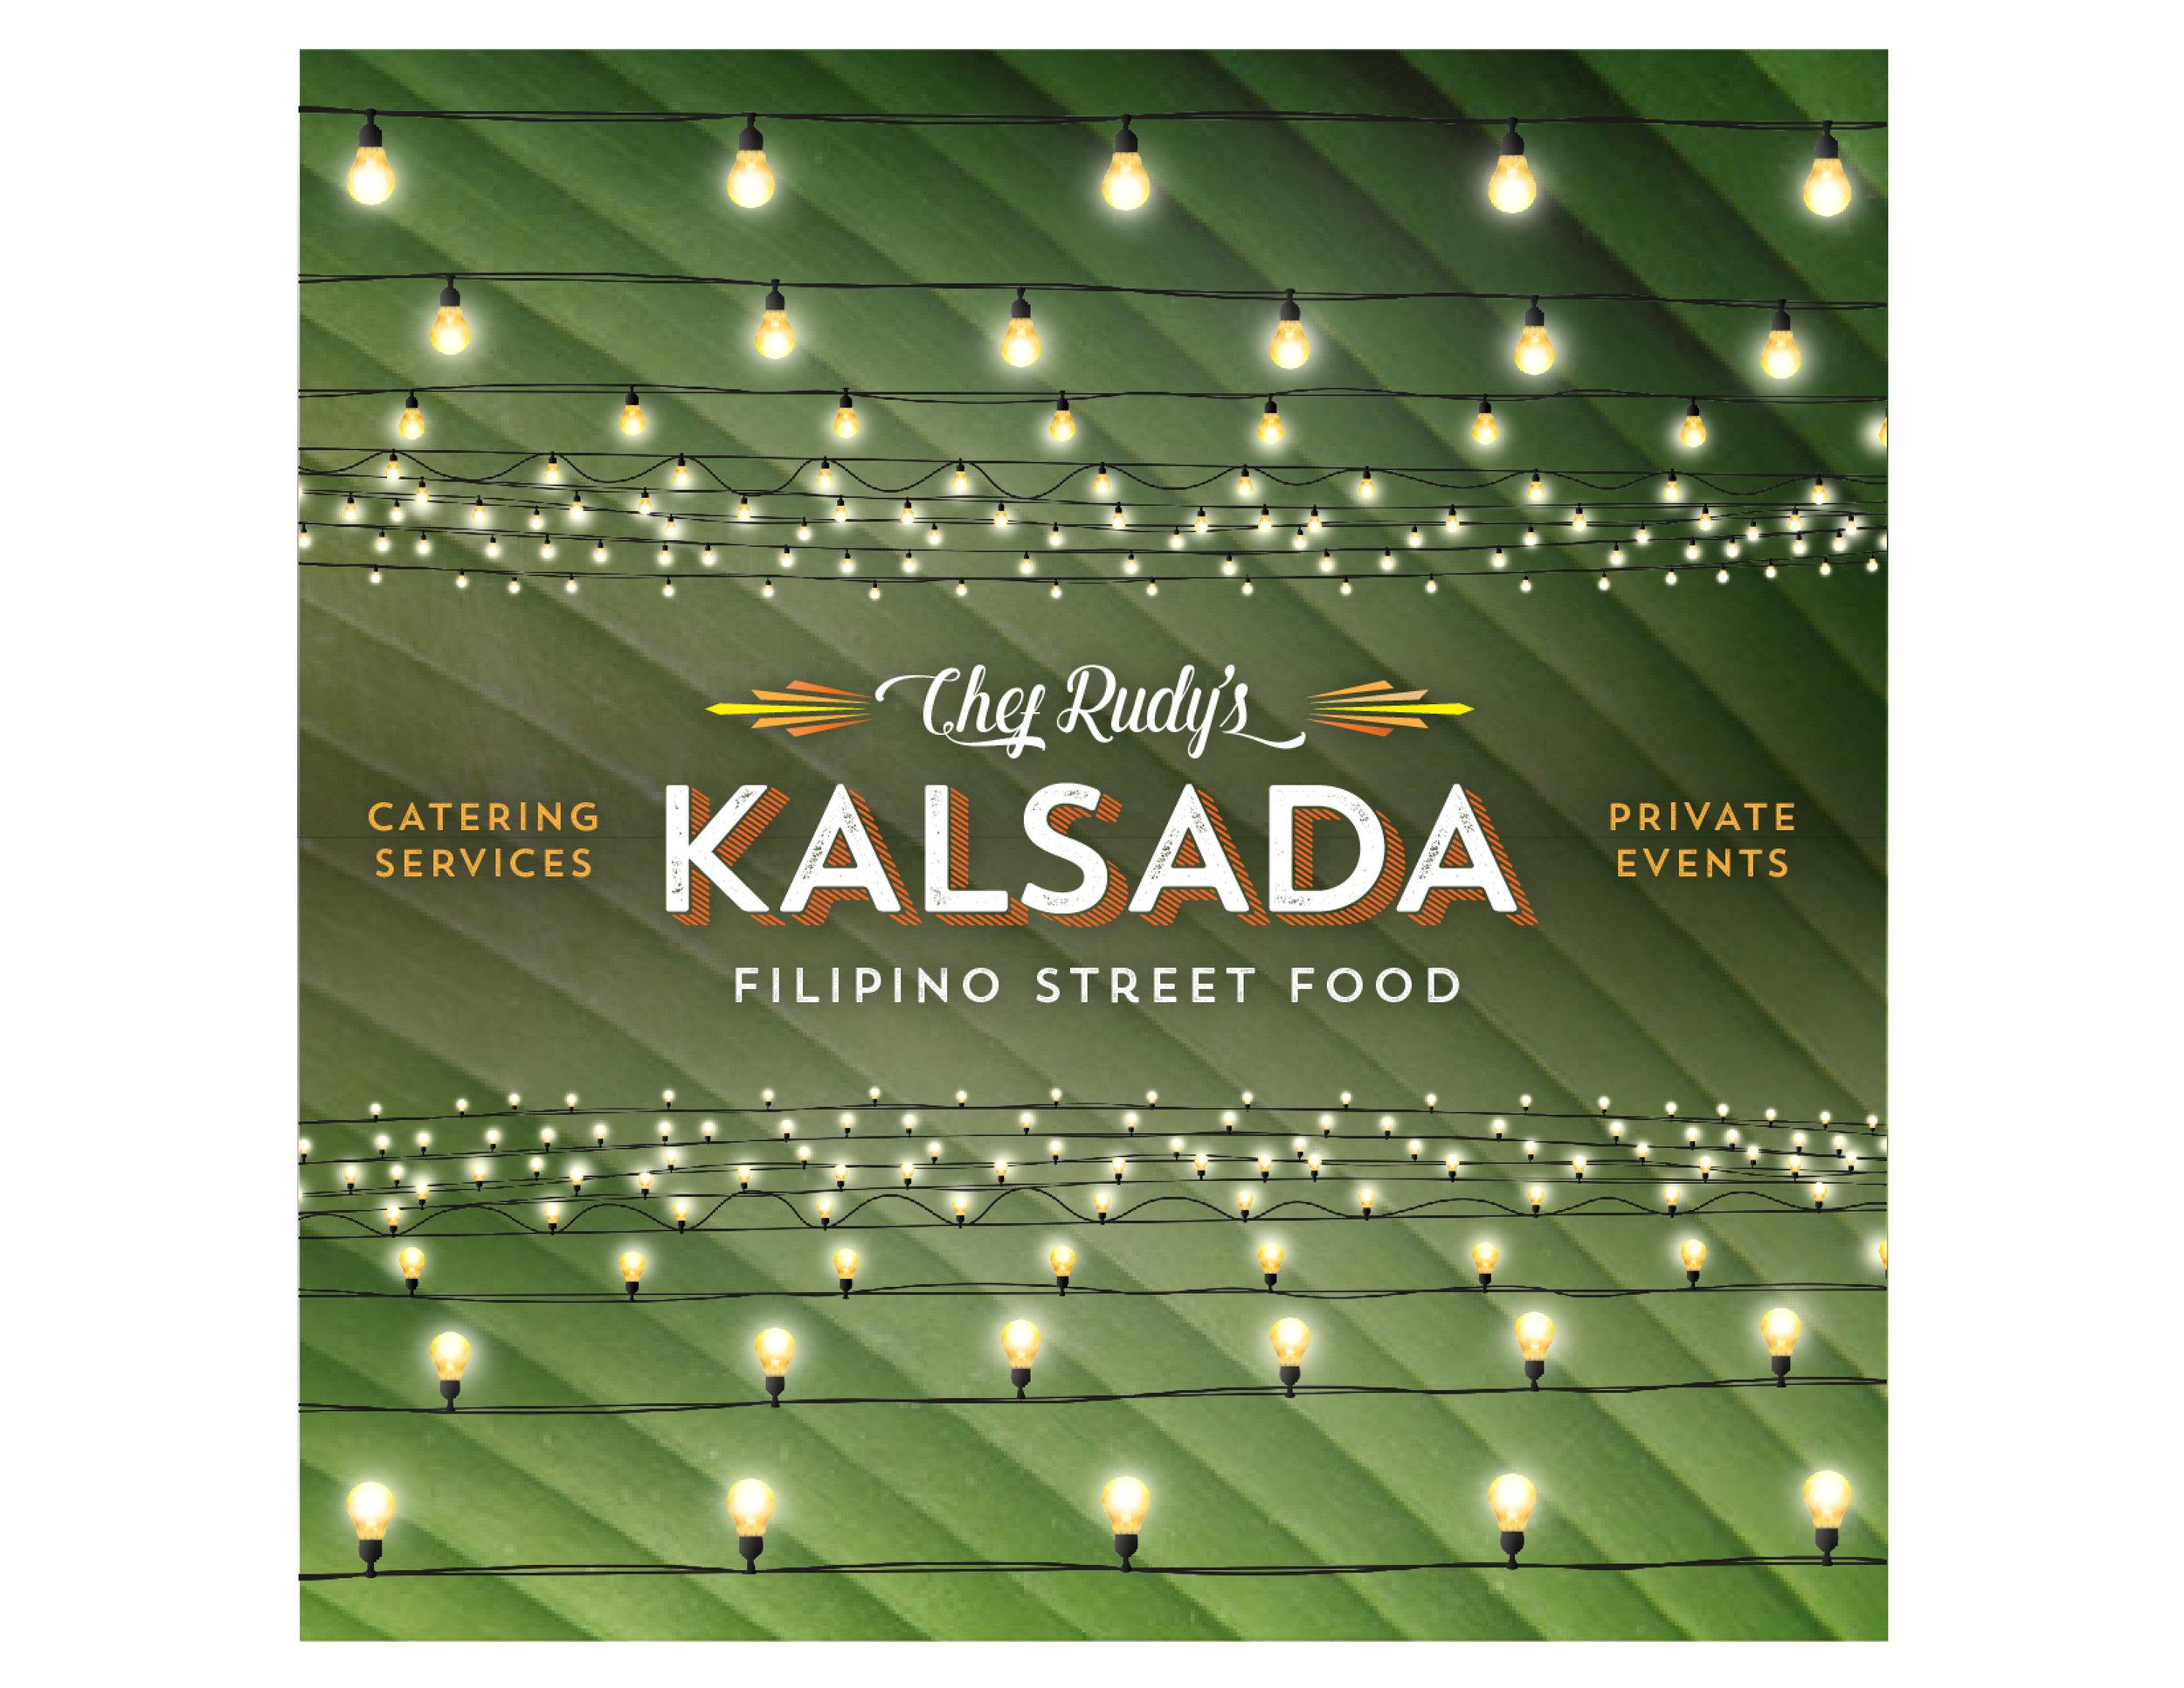 kalsada_catering_promo-forwebsite-01.jpg